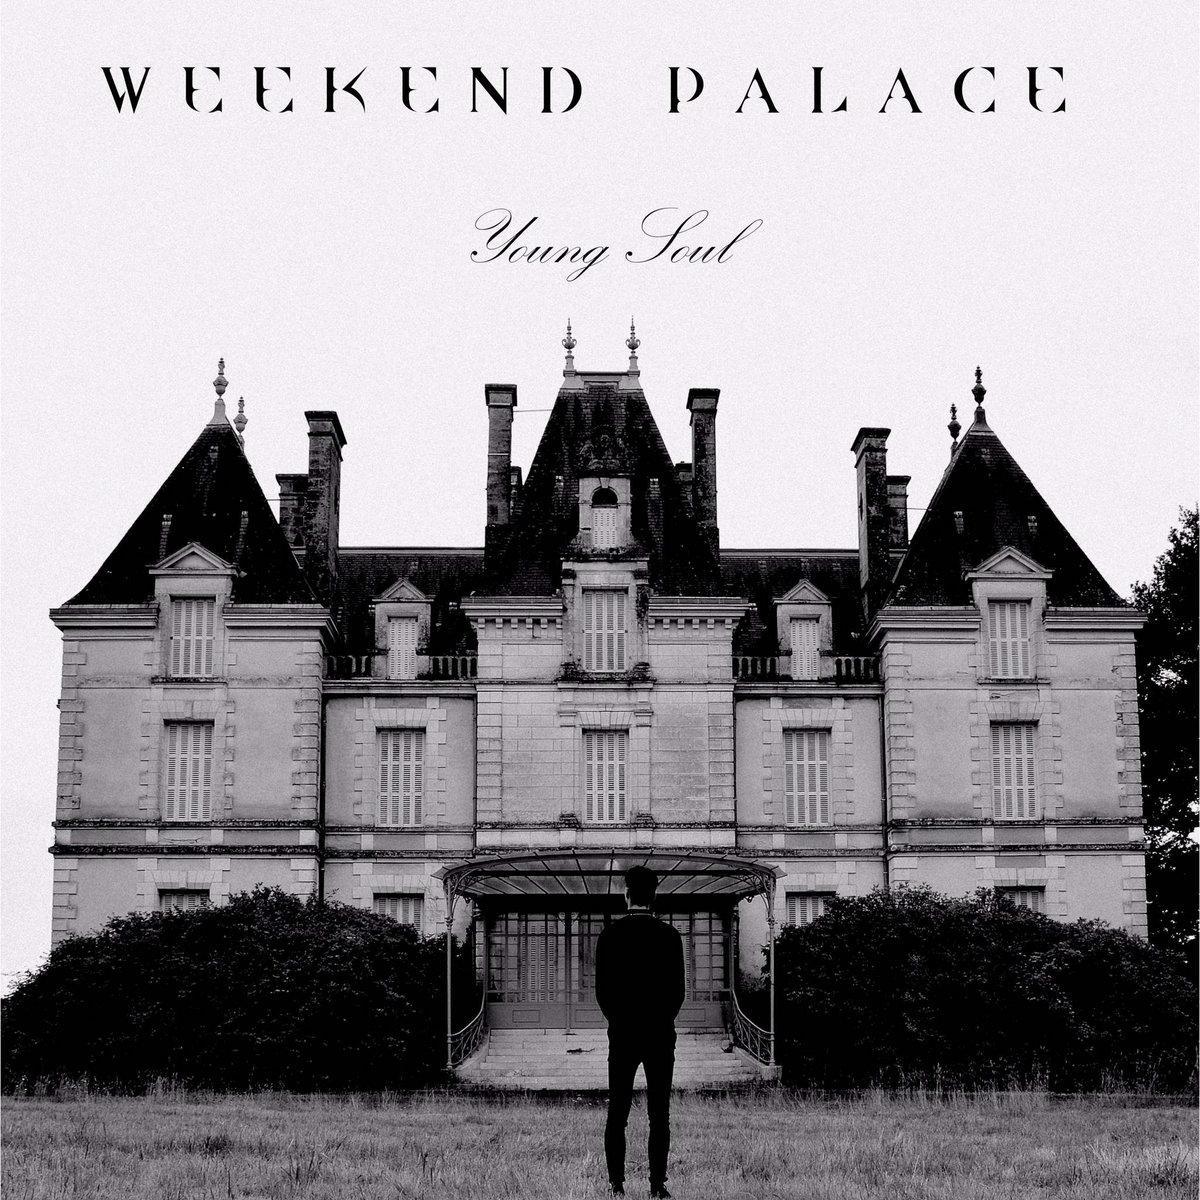 Weekend palace